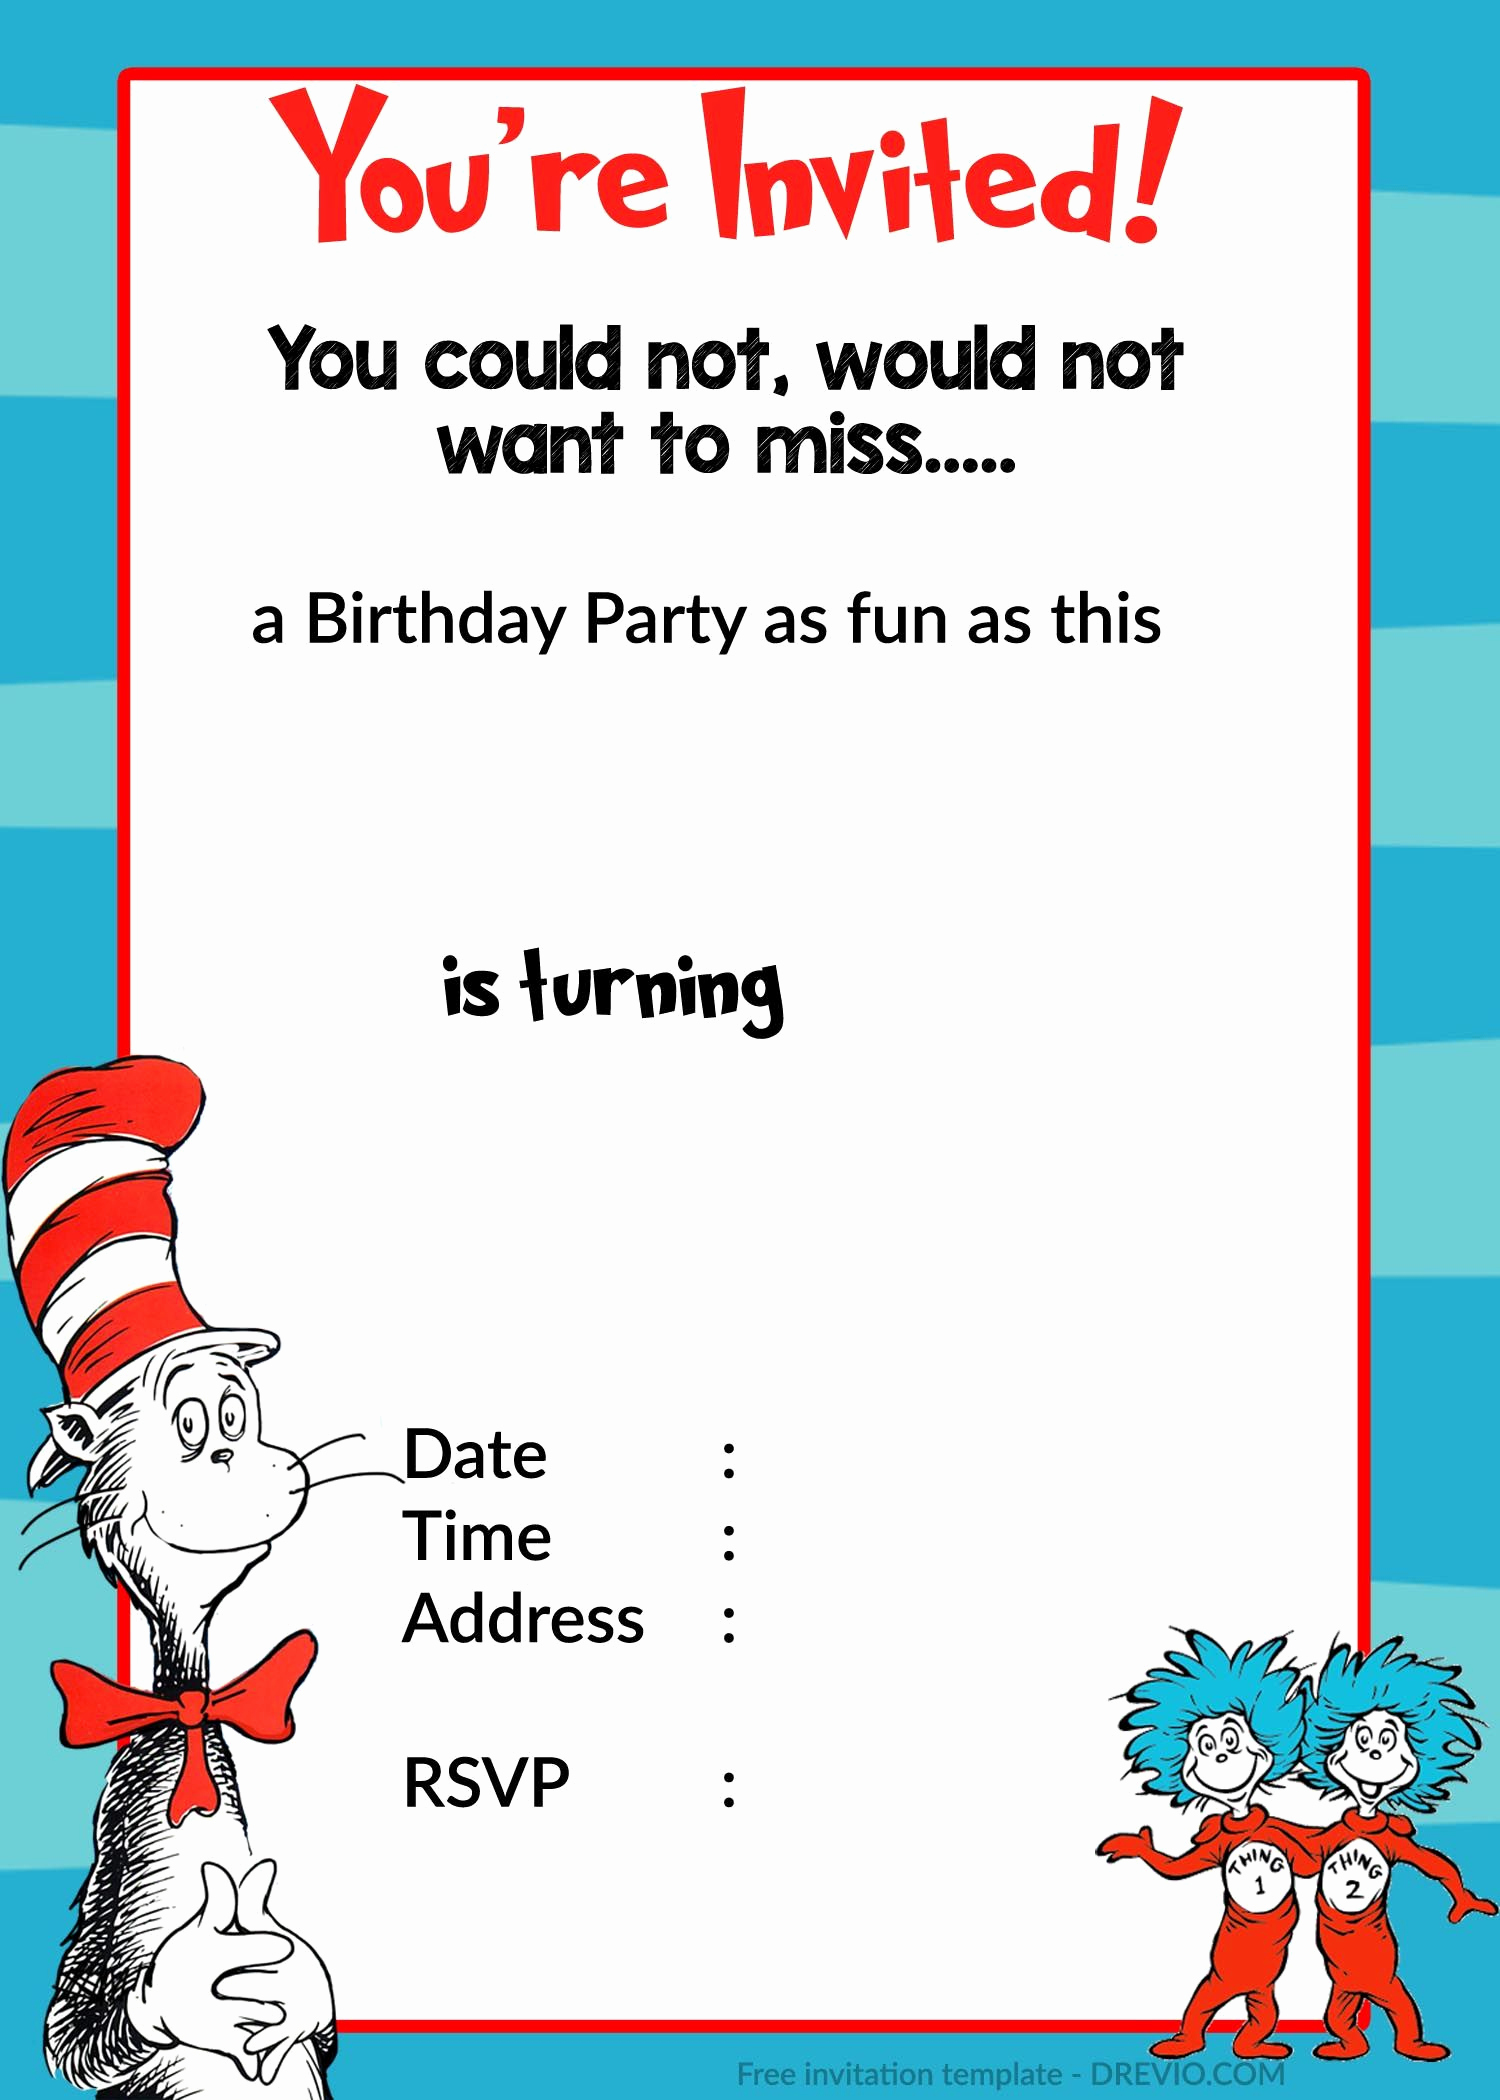 Dr Seuss Invitation Template Awesome Printable Dr Seuss Birthday